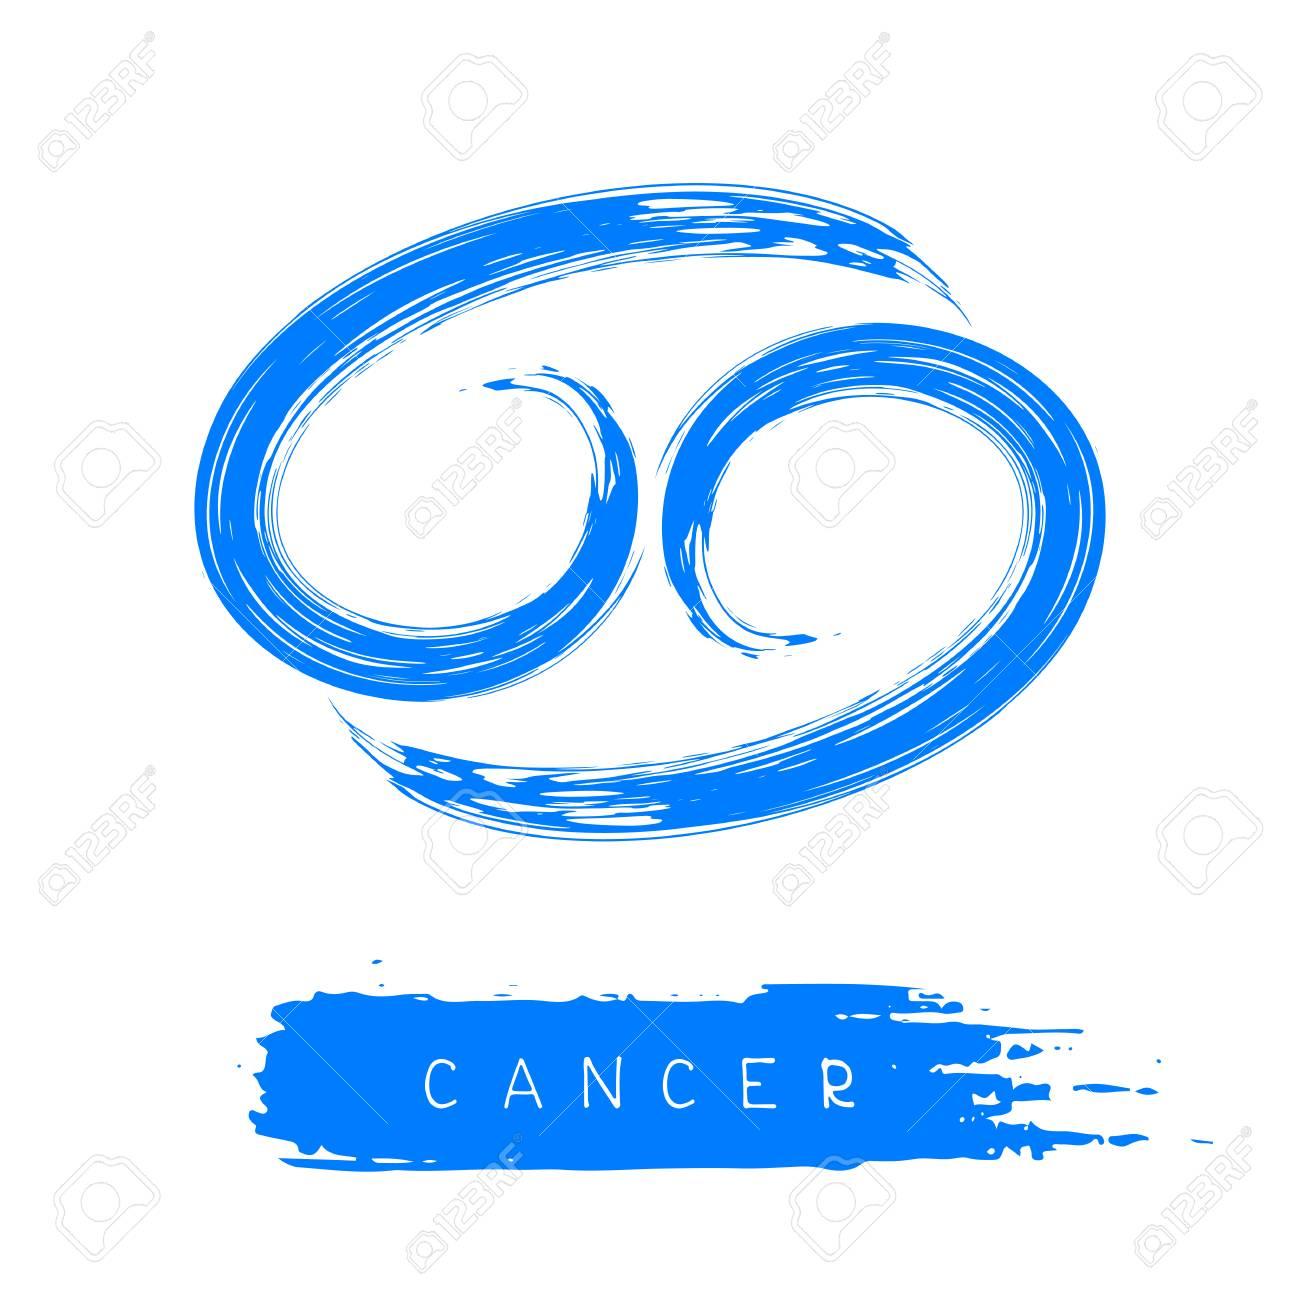 Cancer que fecha es